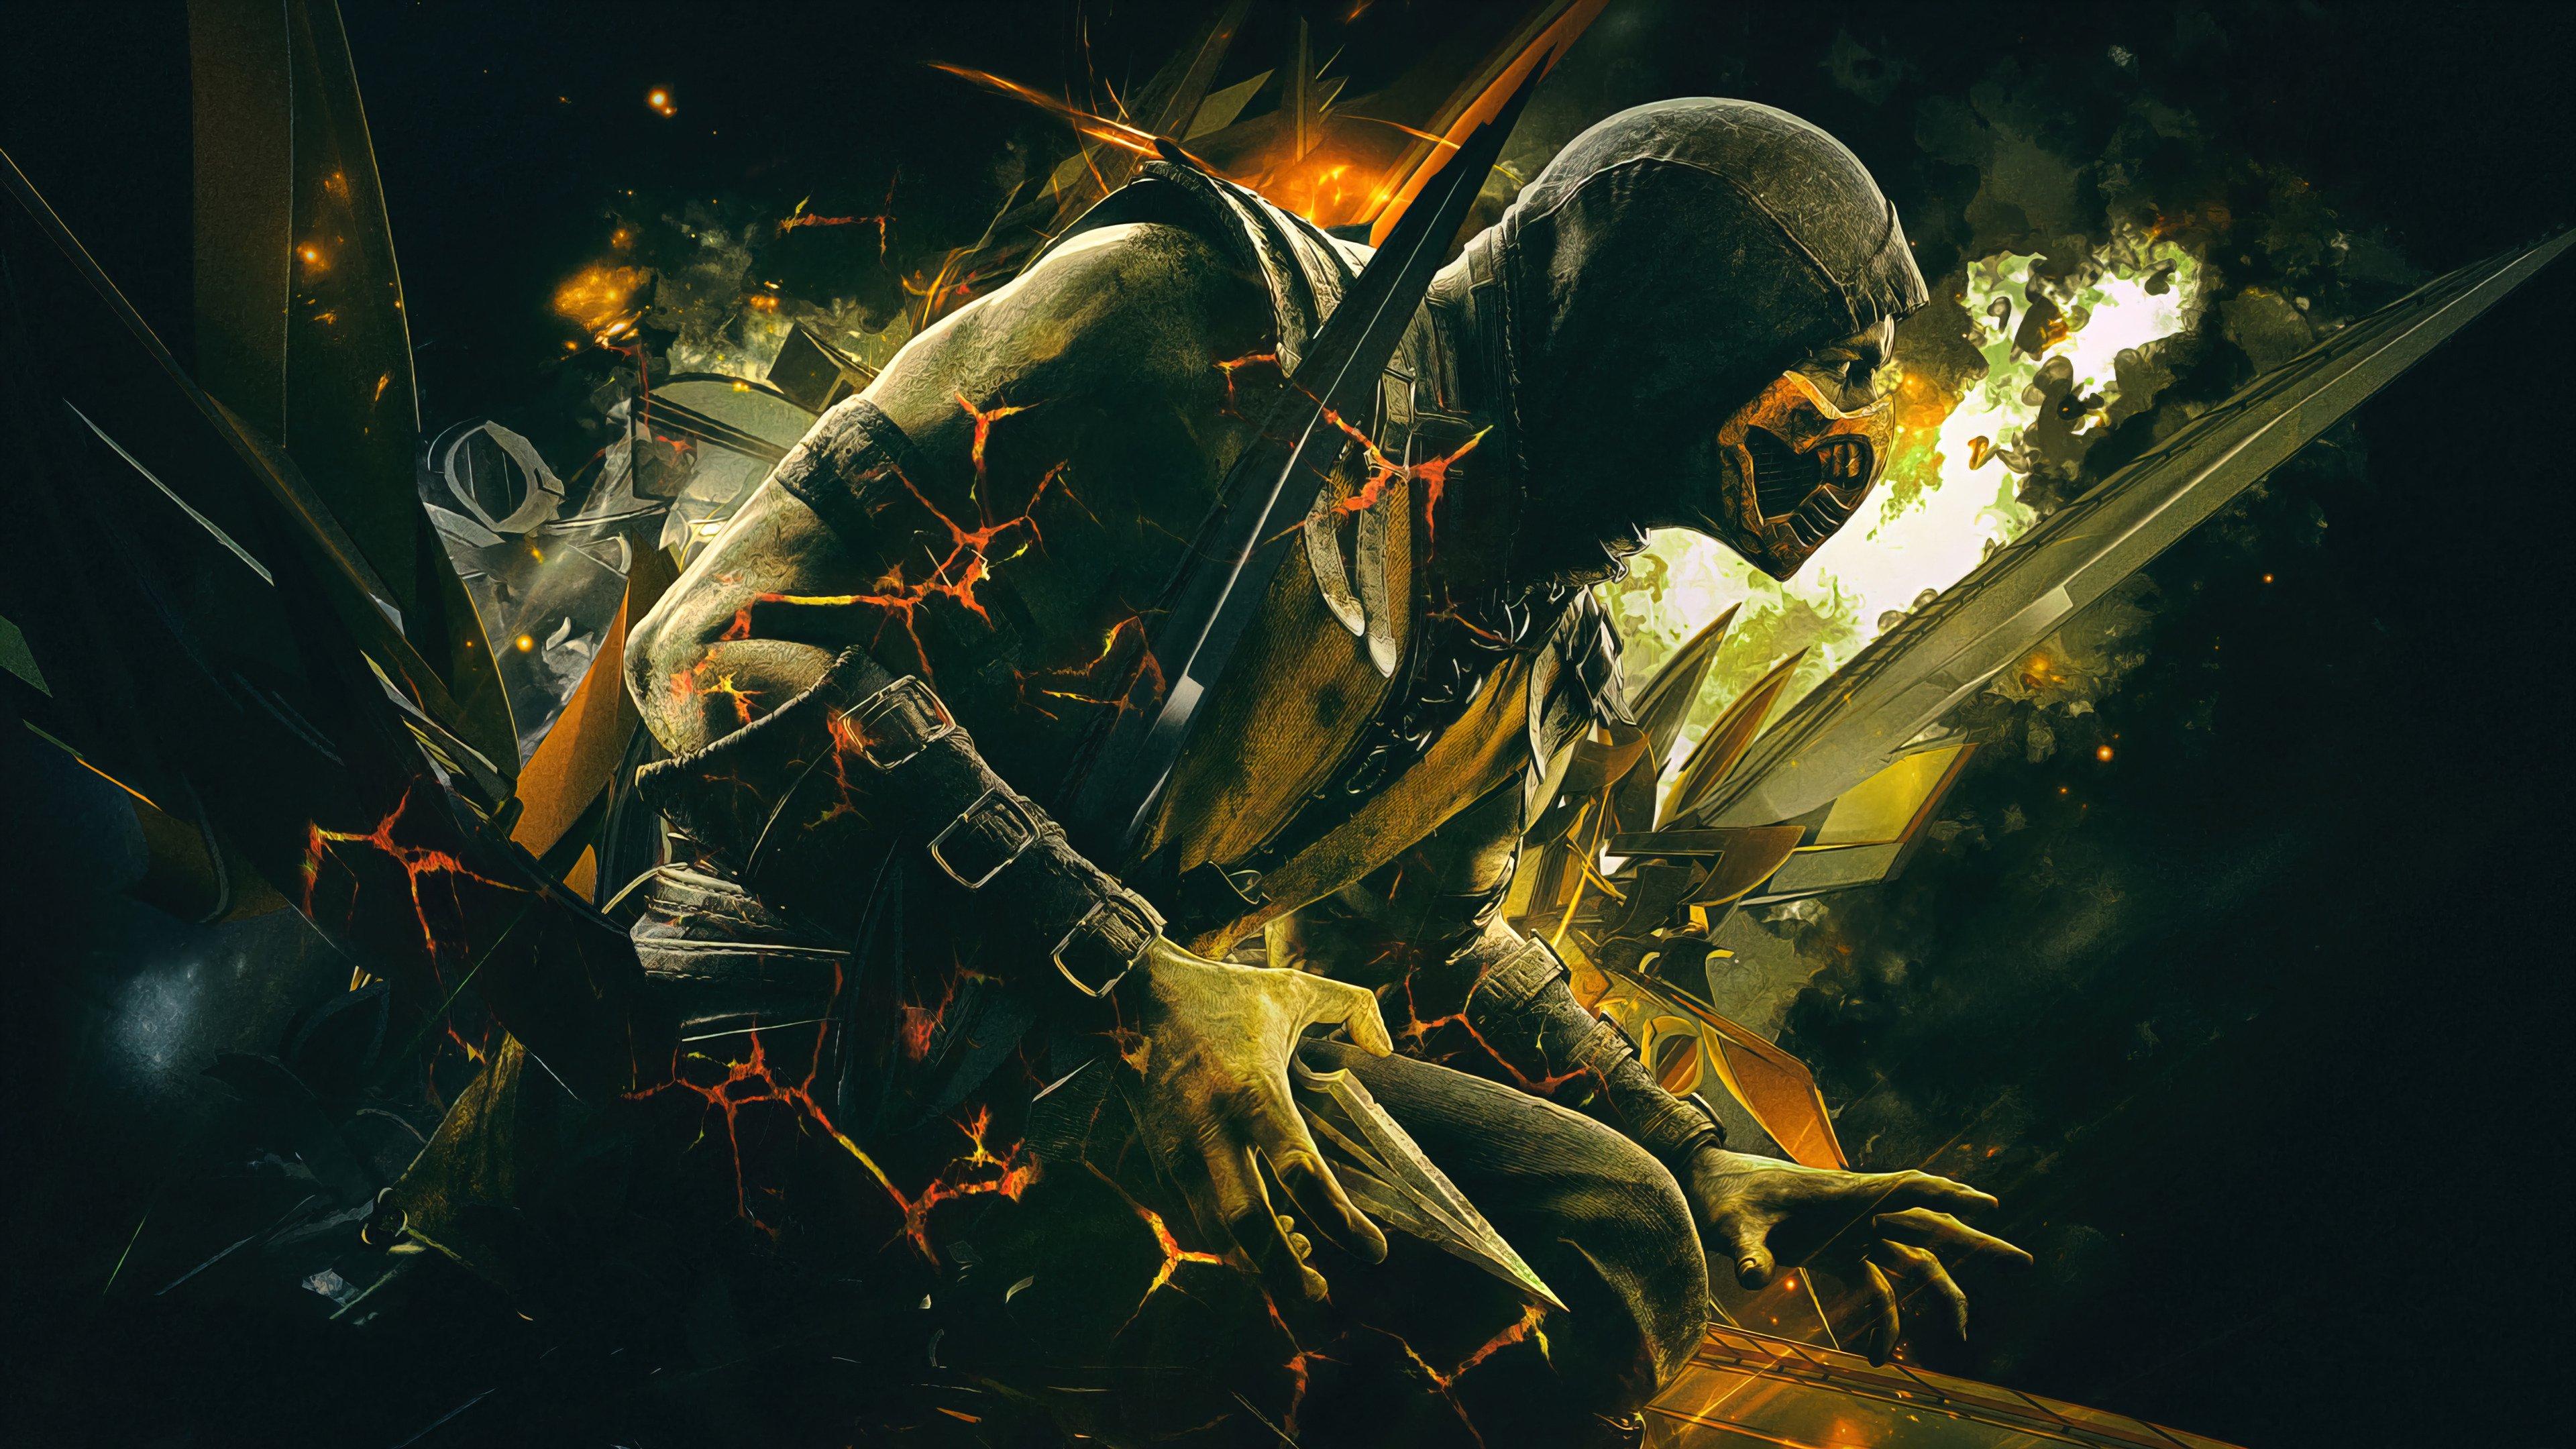 Wallpaper Scorpion Mortal Kombat X